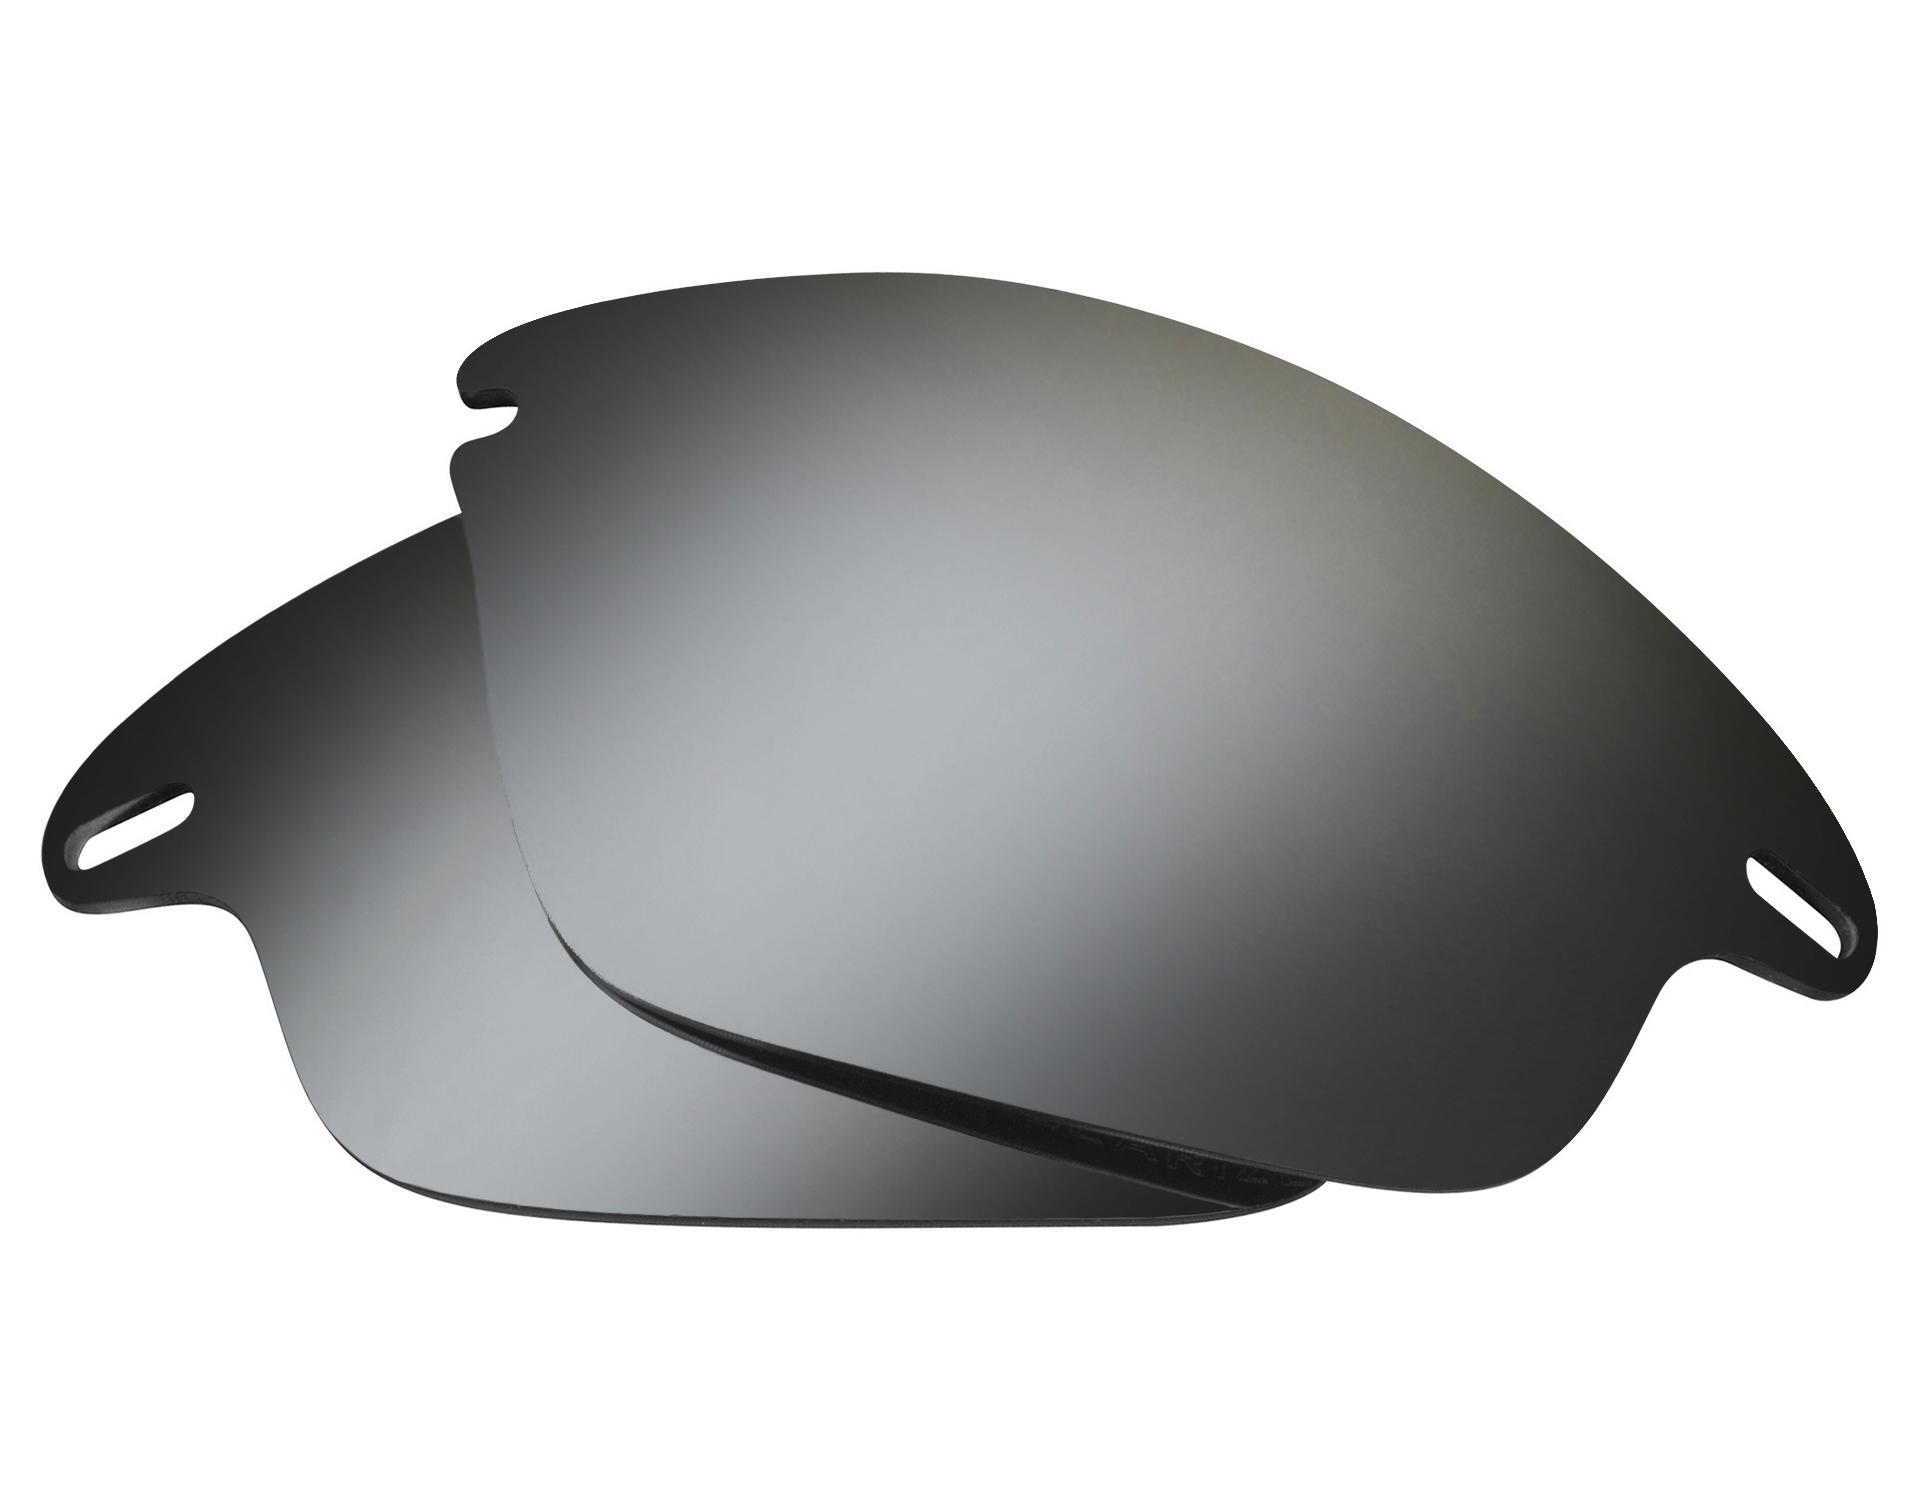 PapaViva Polarized Replacement Lenses For Spy Optic Helm Sunglasses Options